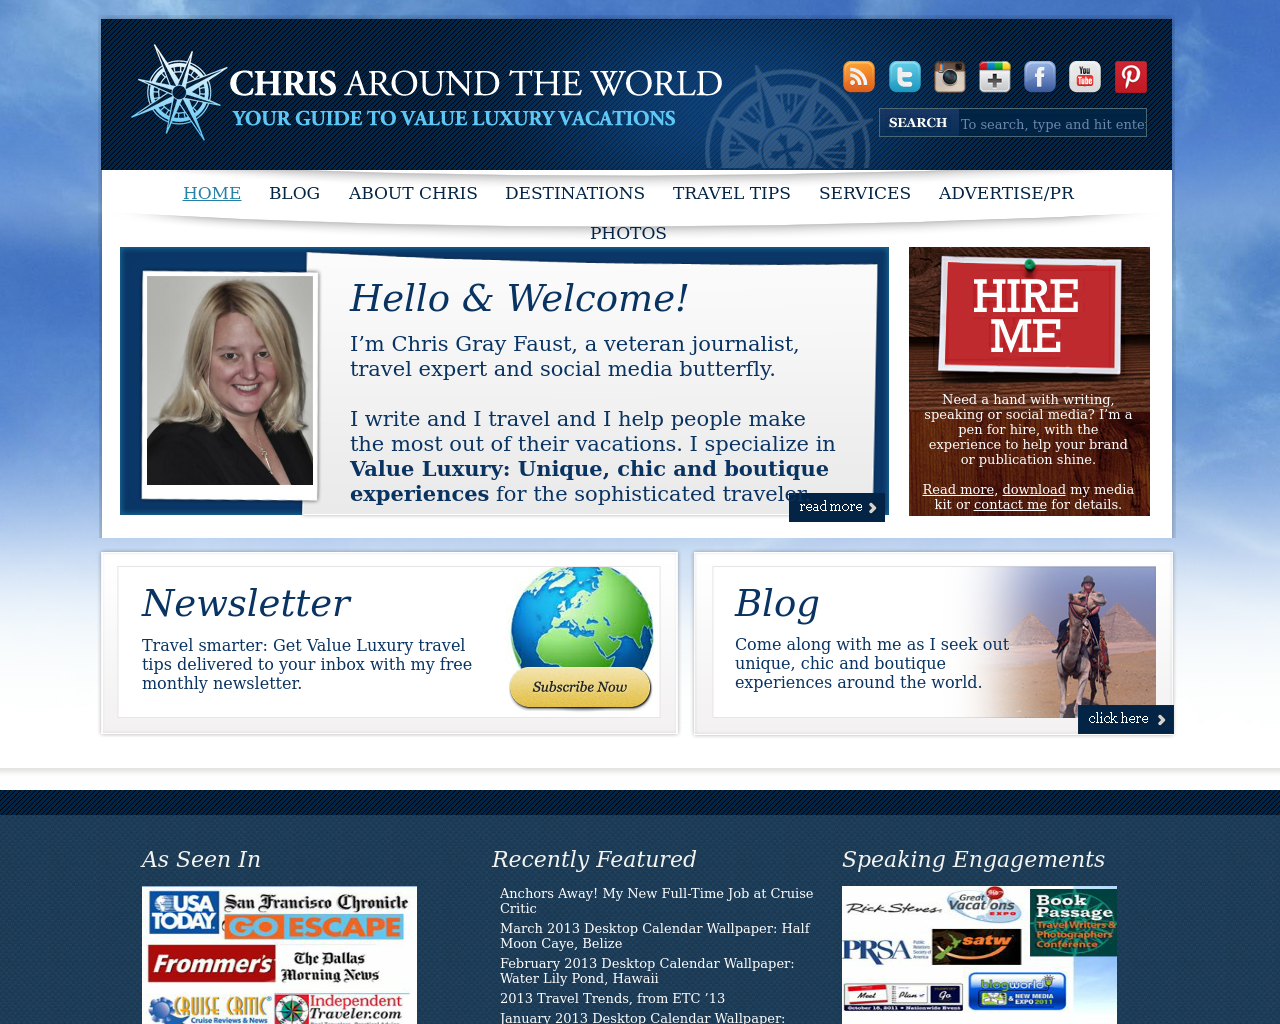 Chris-Around-The-World-Advertising-Reviews-Pricing